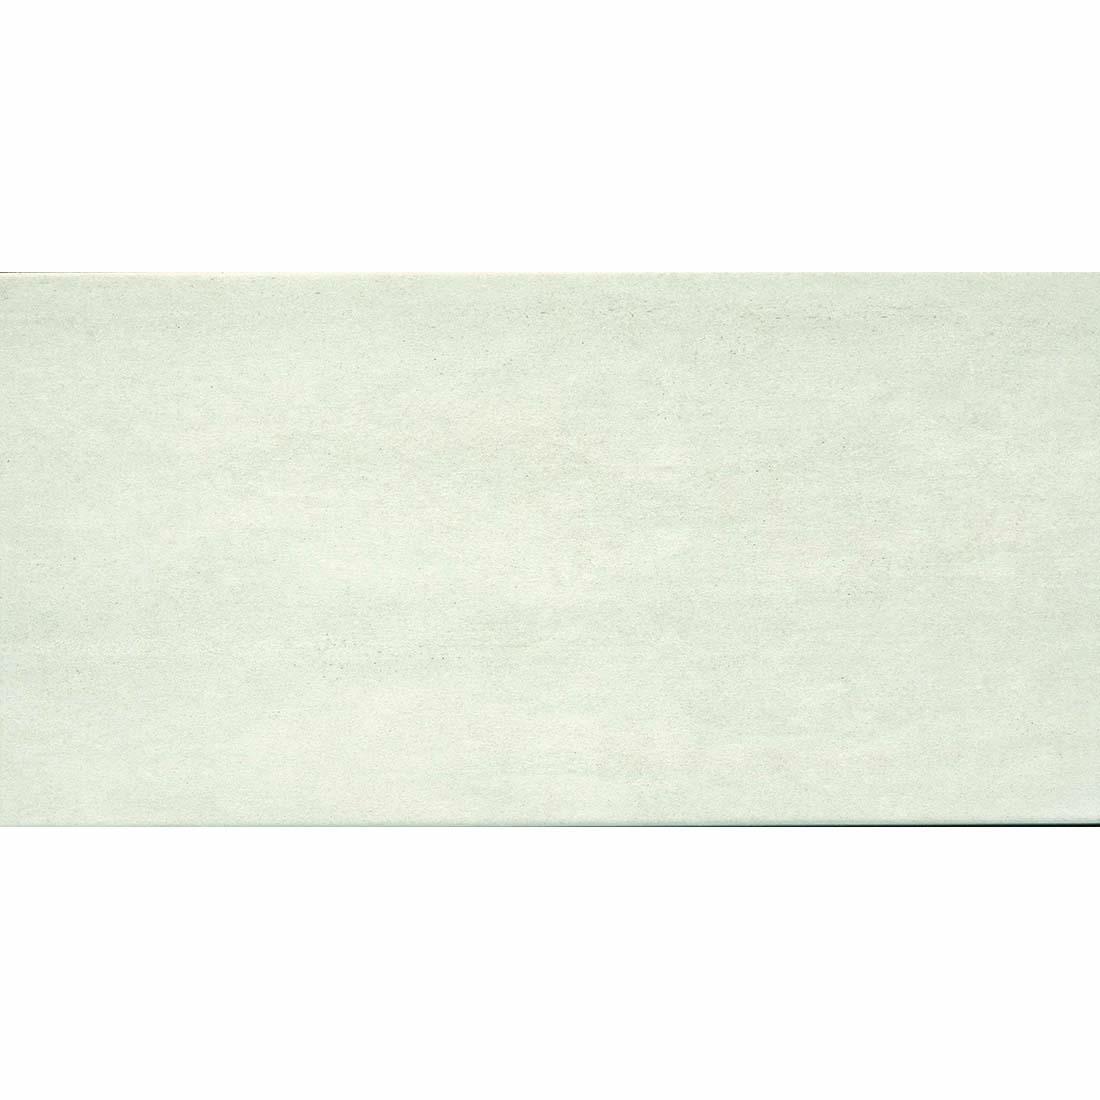 Westside 30x60 Beyaz Matt 1